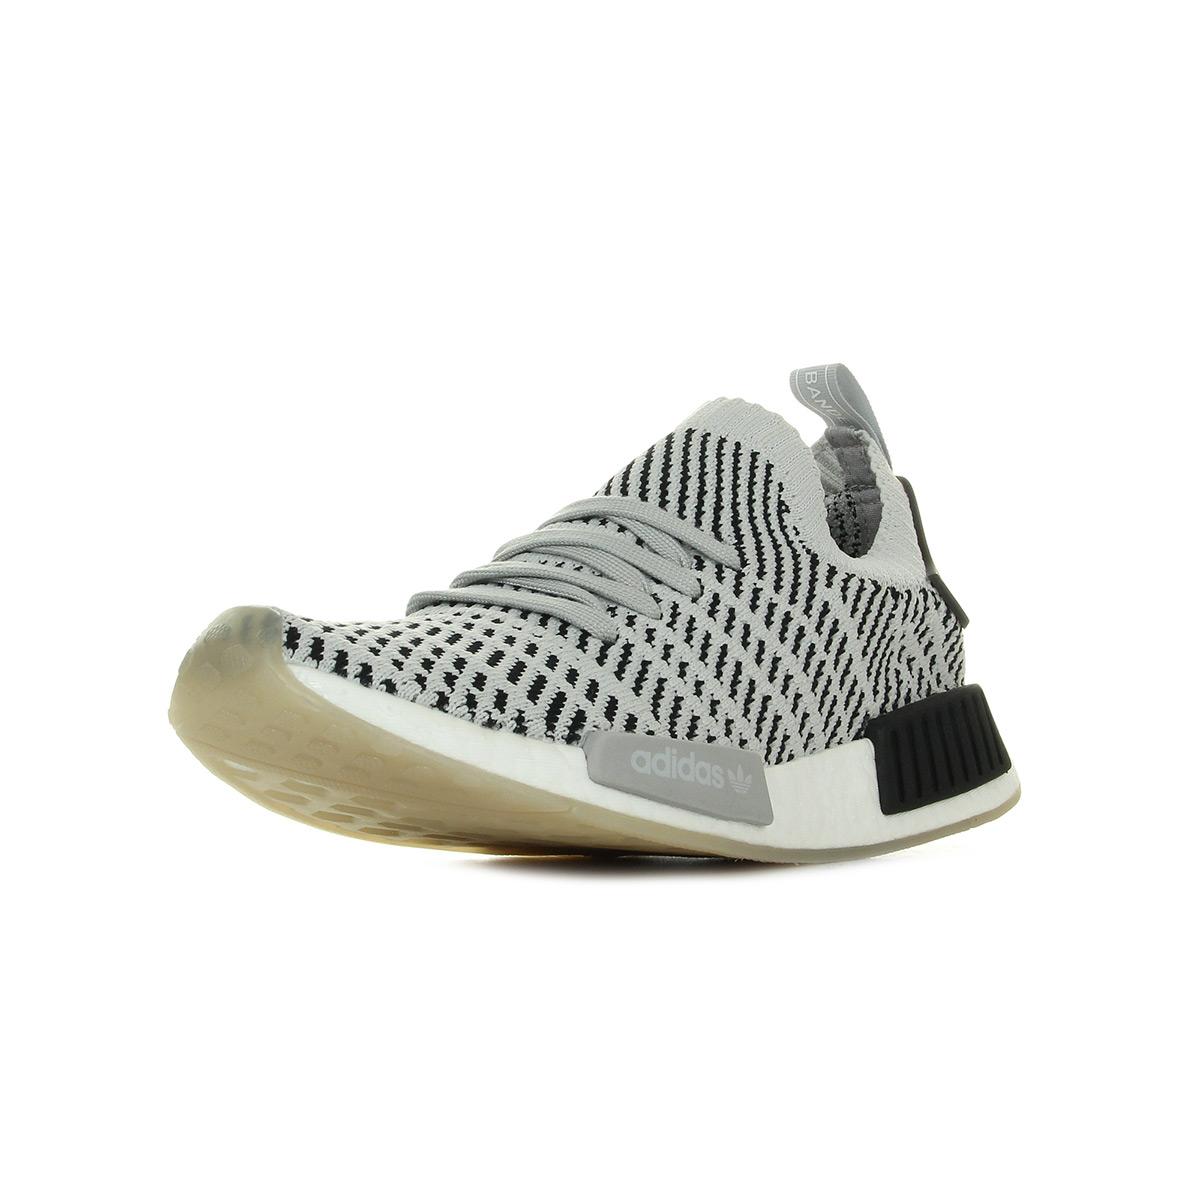 adidas Nmd R1 Stlt Pk CQ2387, Baskets mode homme